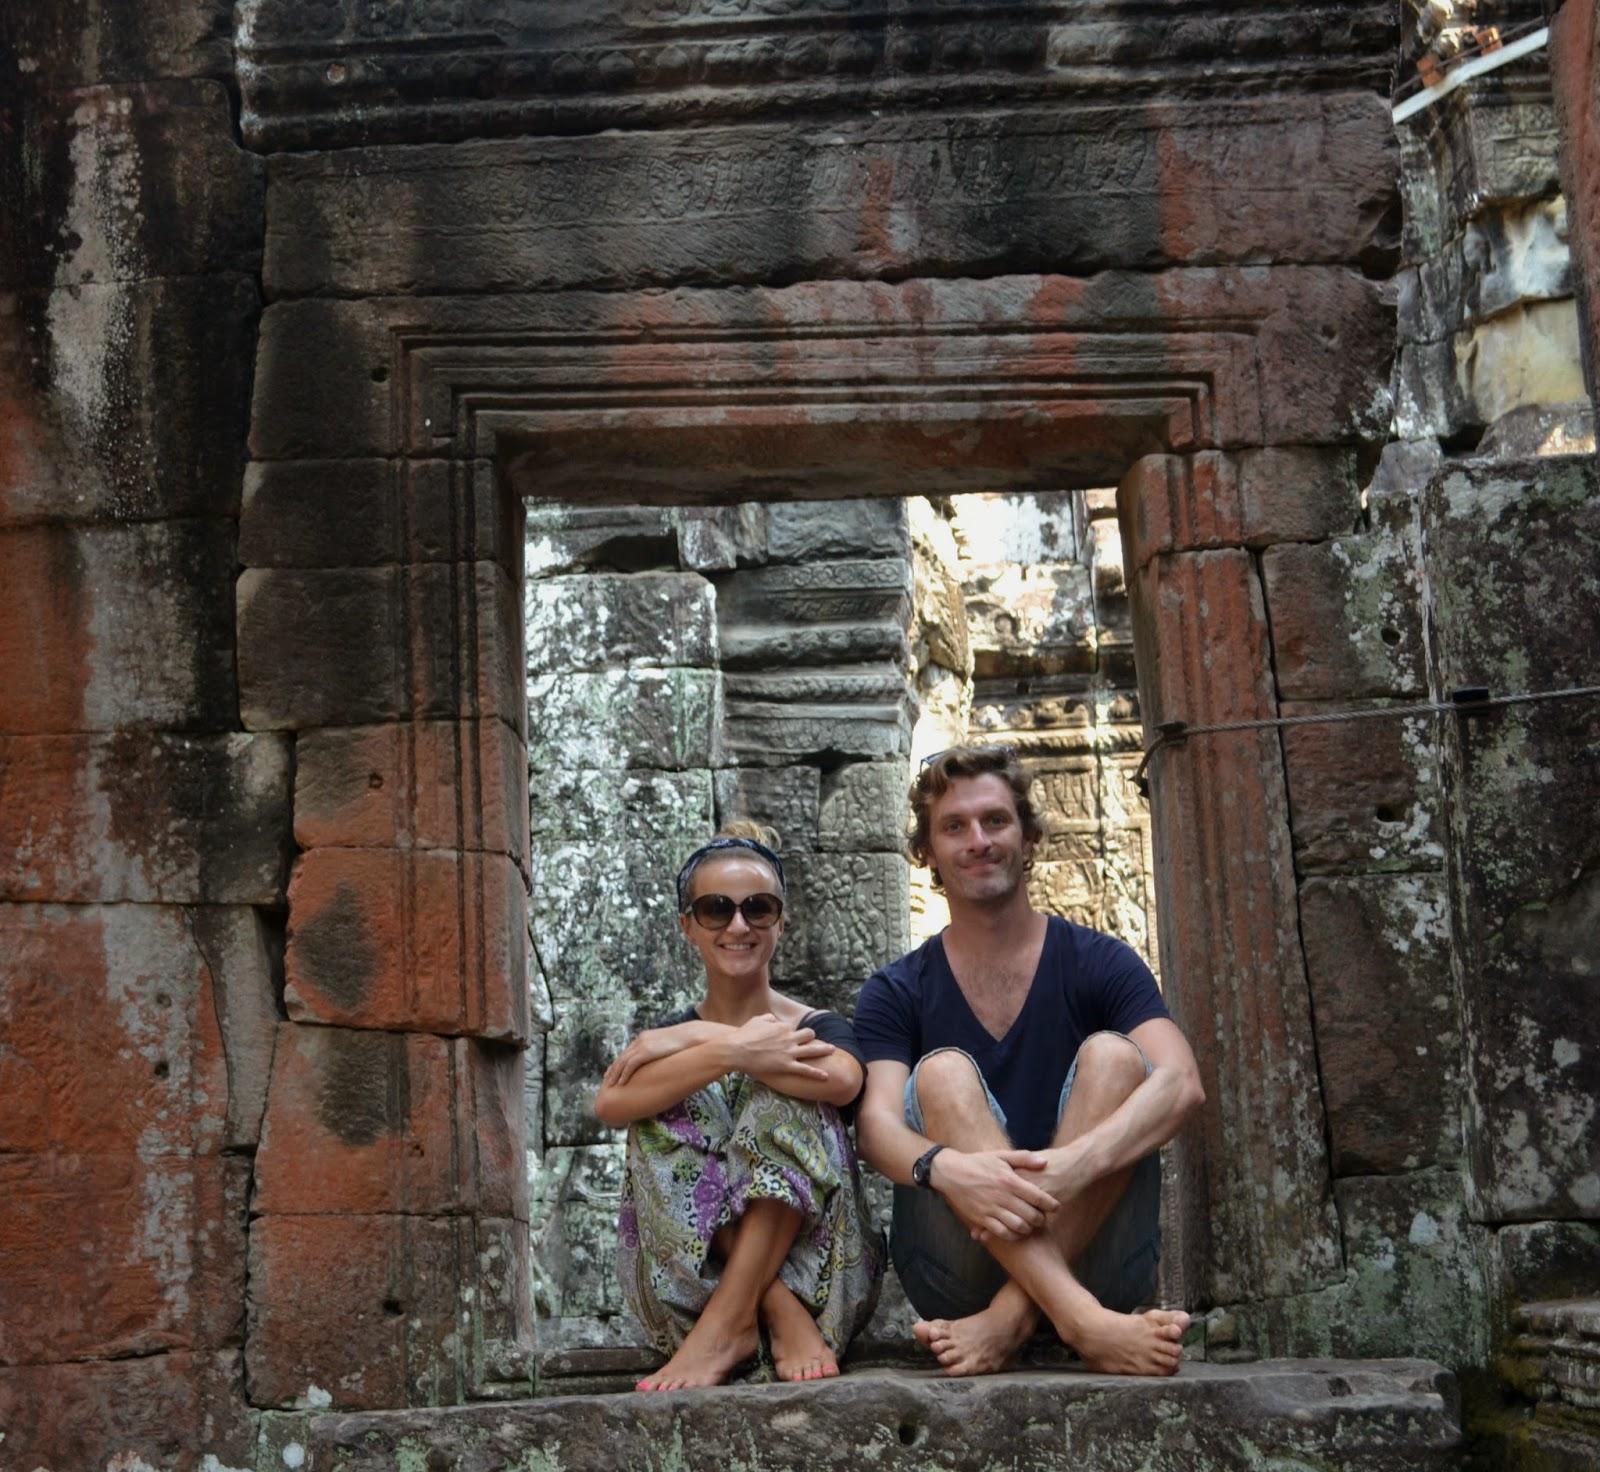 Banteay Kdei Temple Angkor Wat Siem Reap Cambodia